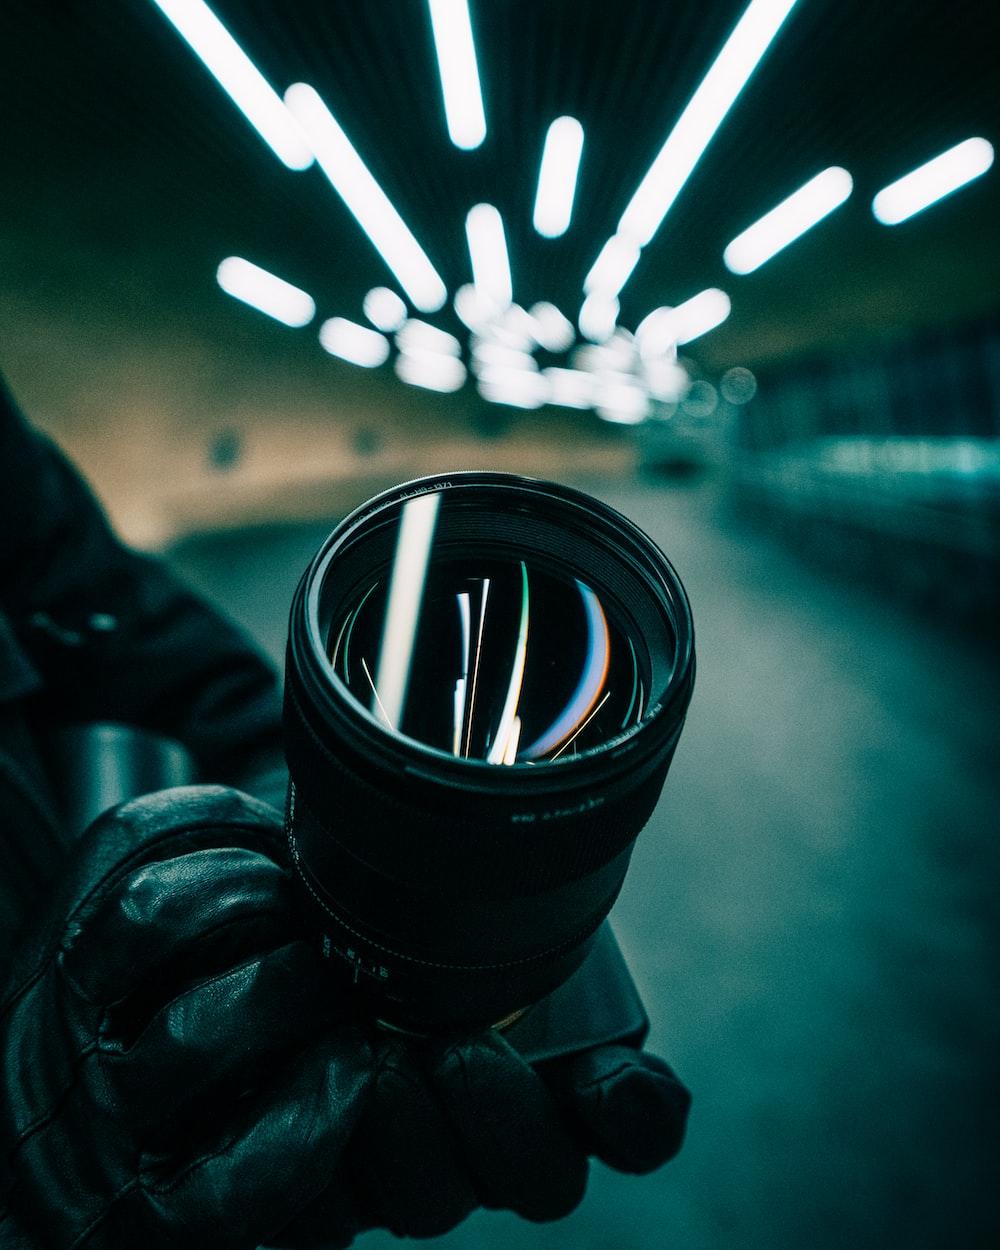 black dslr camera lens on persons hand